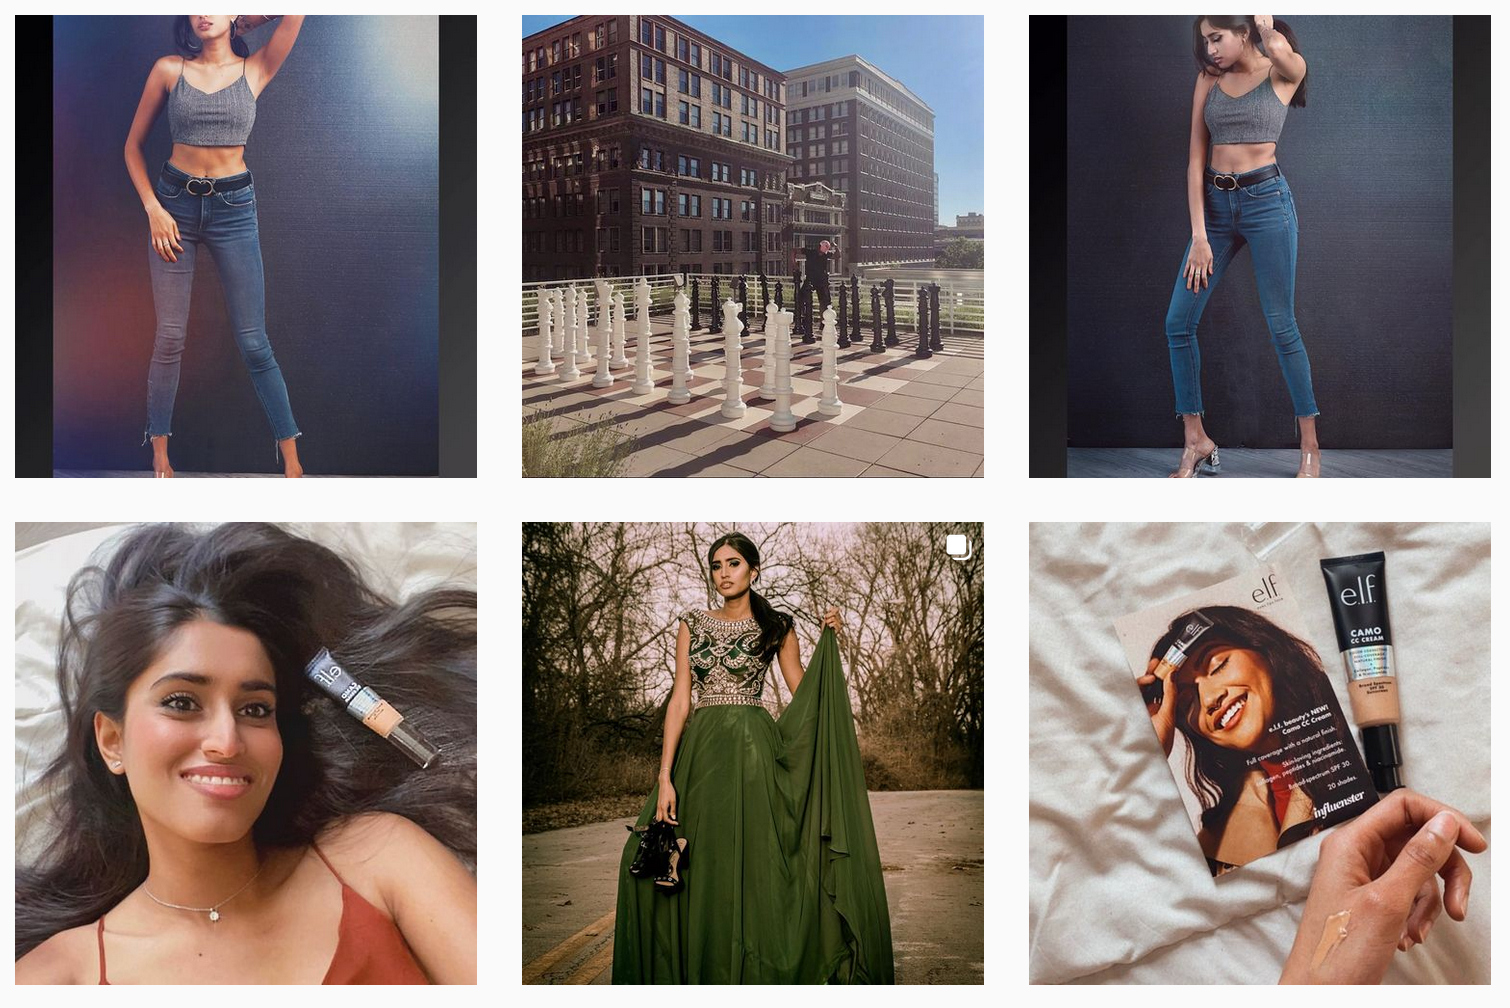 Shiona Deliozar | Fashion Influencers Featured on Afluencer